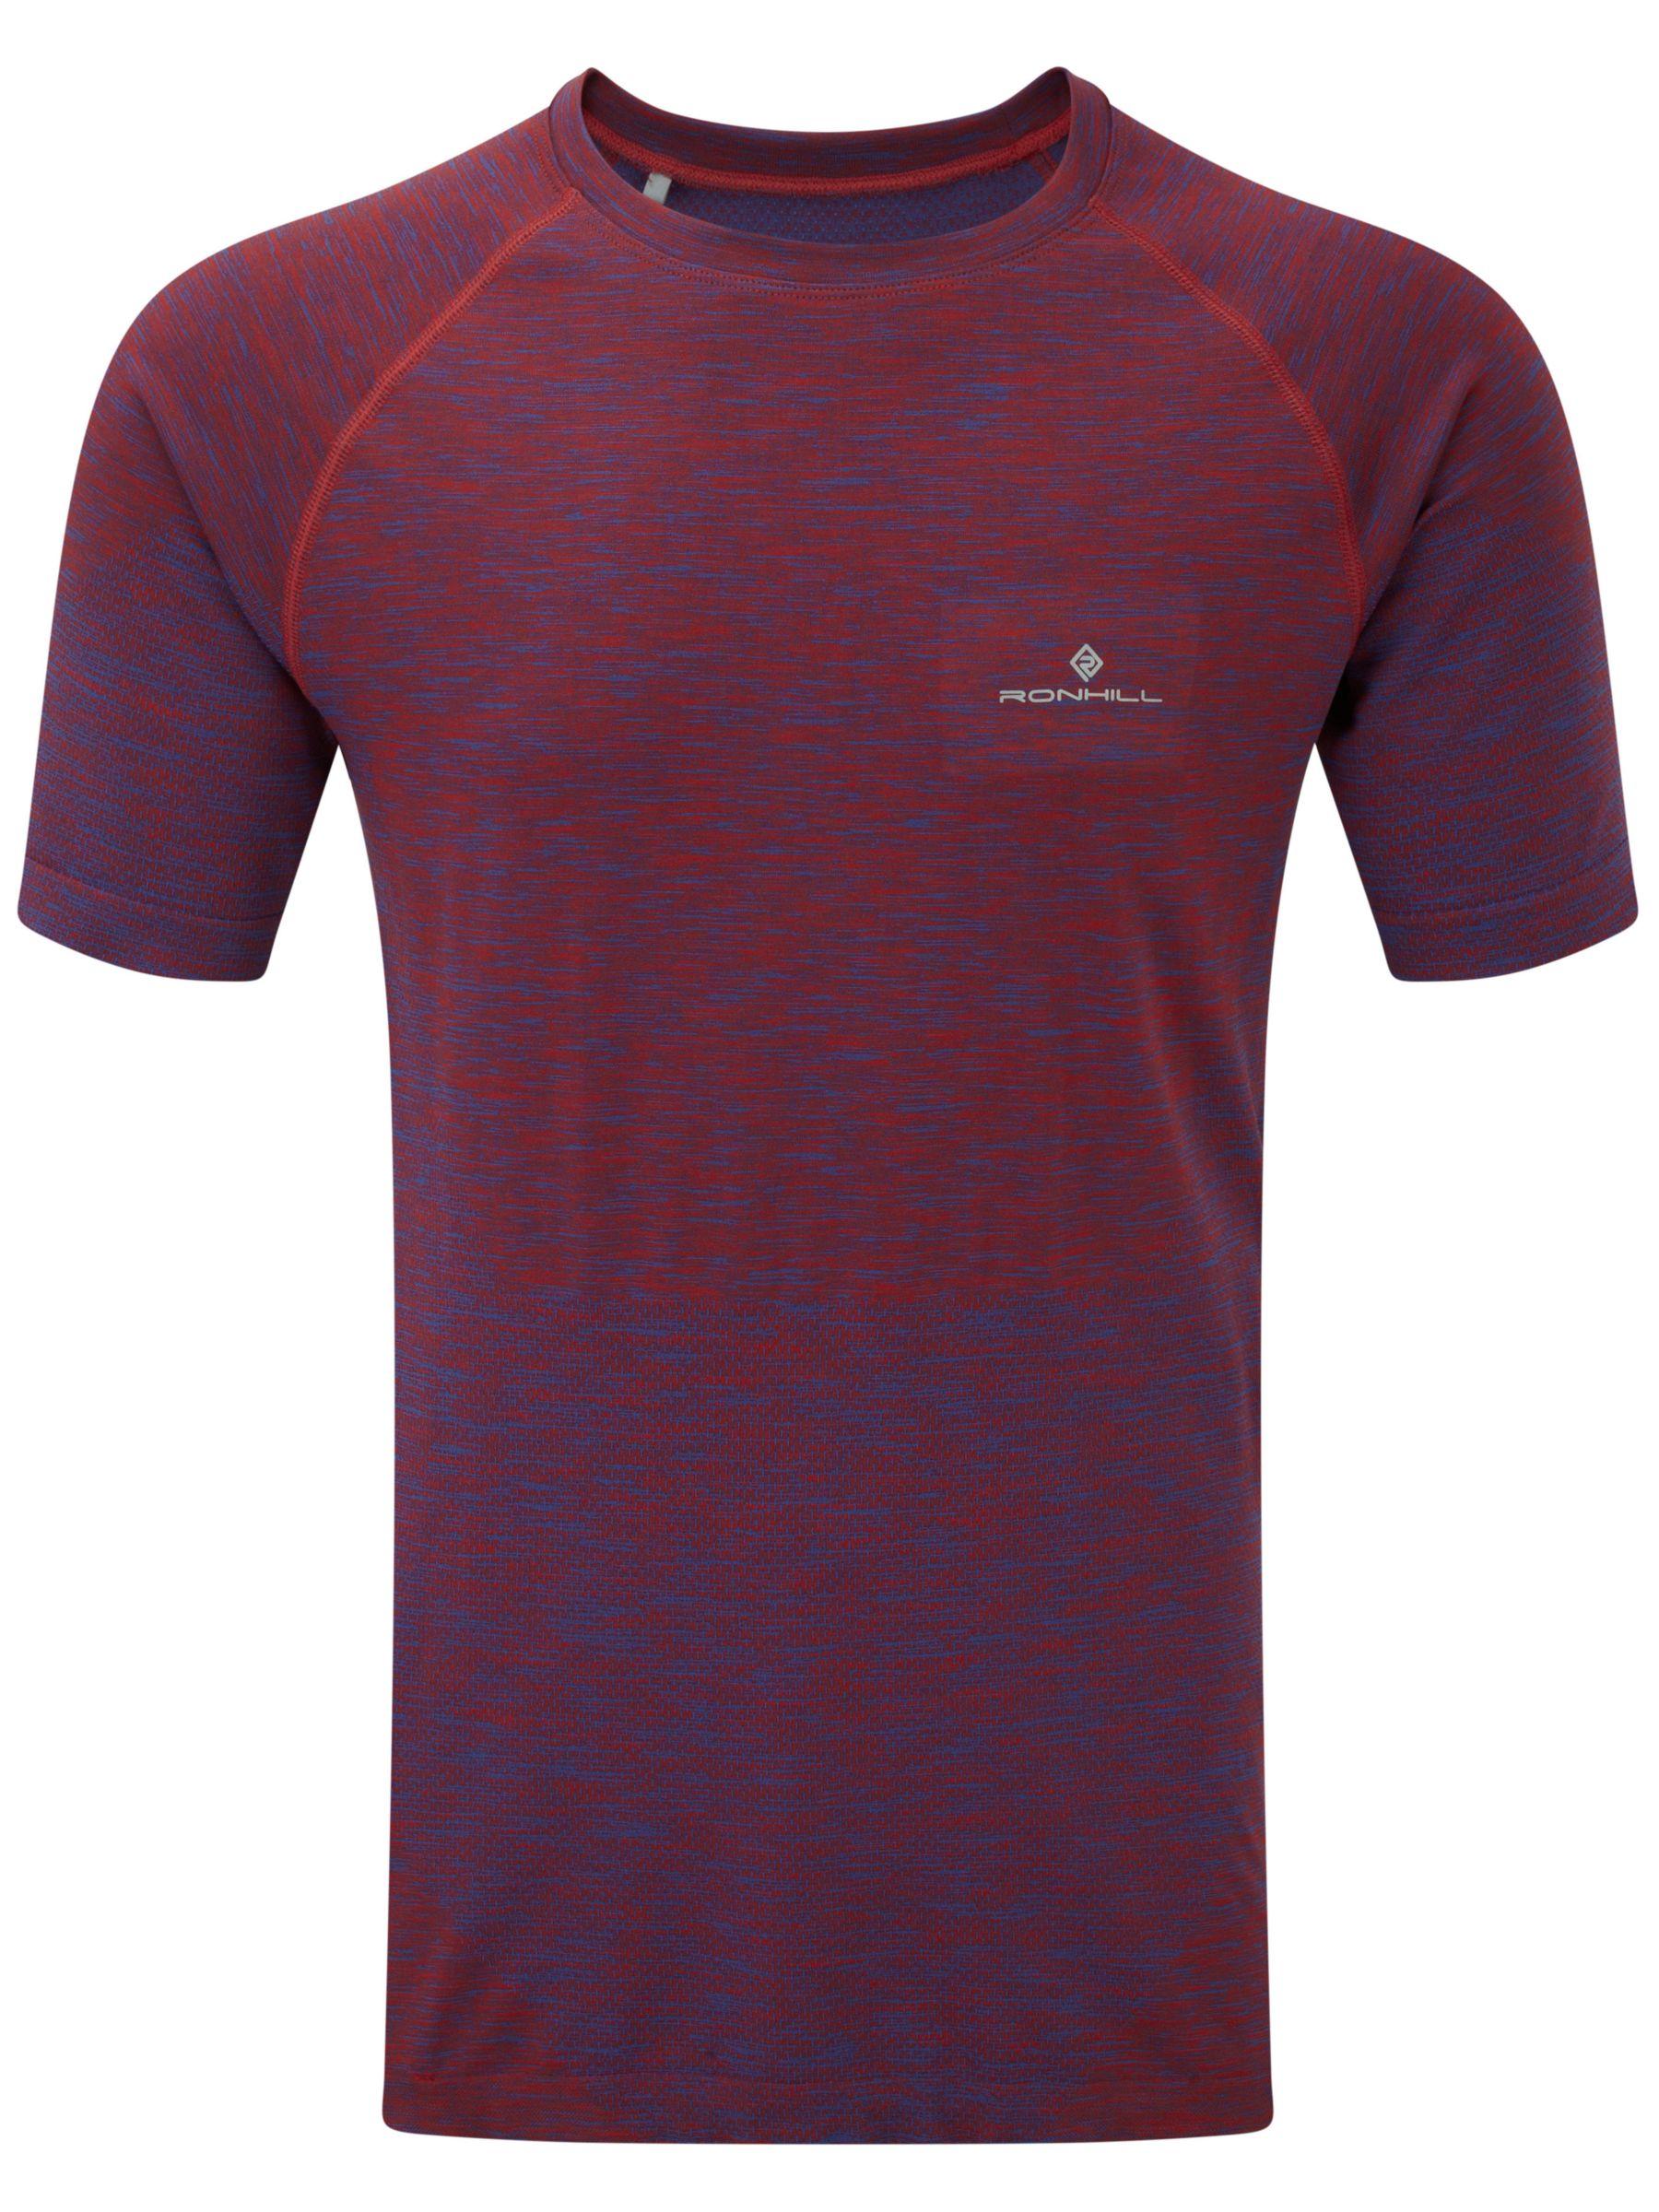 Ronhill Ronhill Infinity Short Sleeve Running T-Shirt, Purple/Red